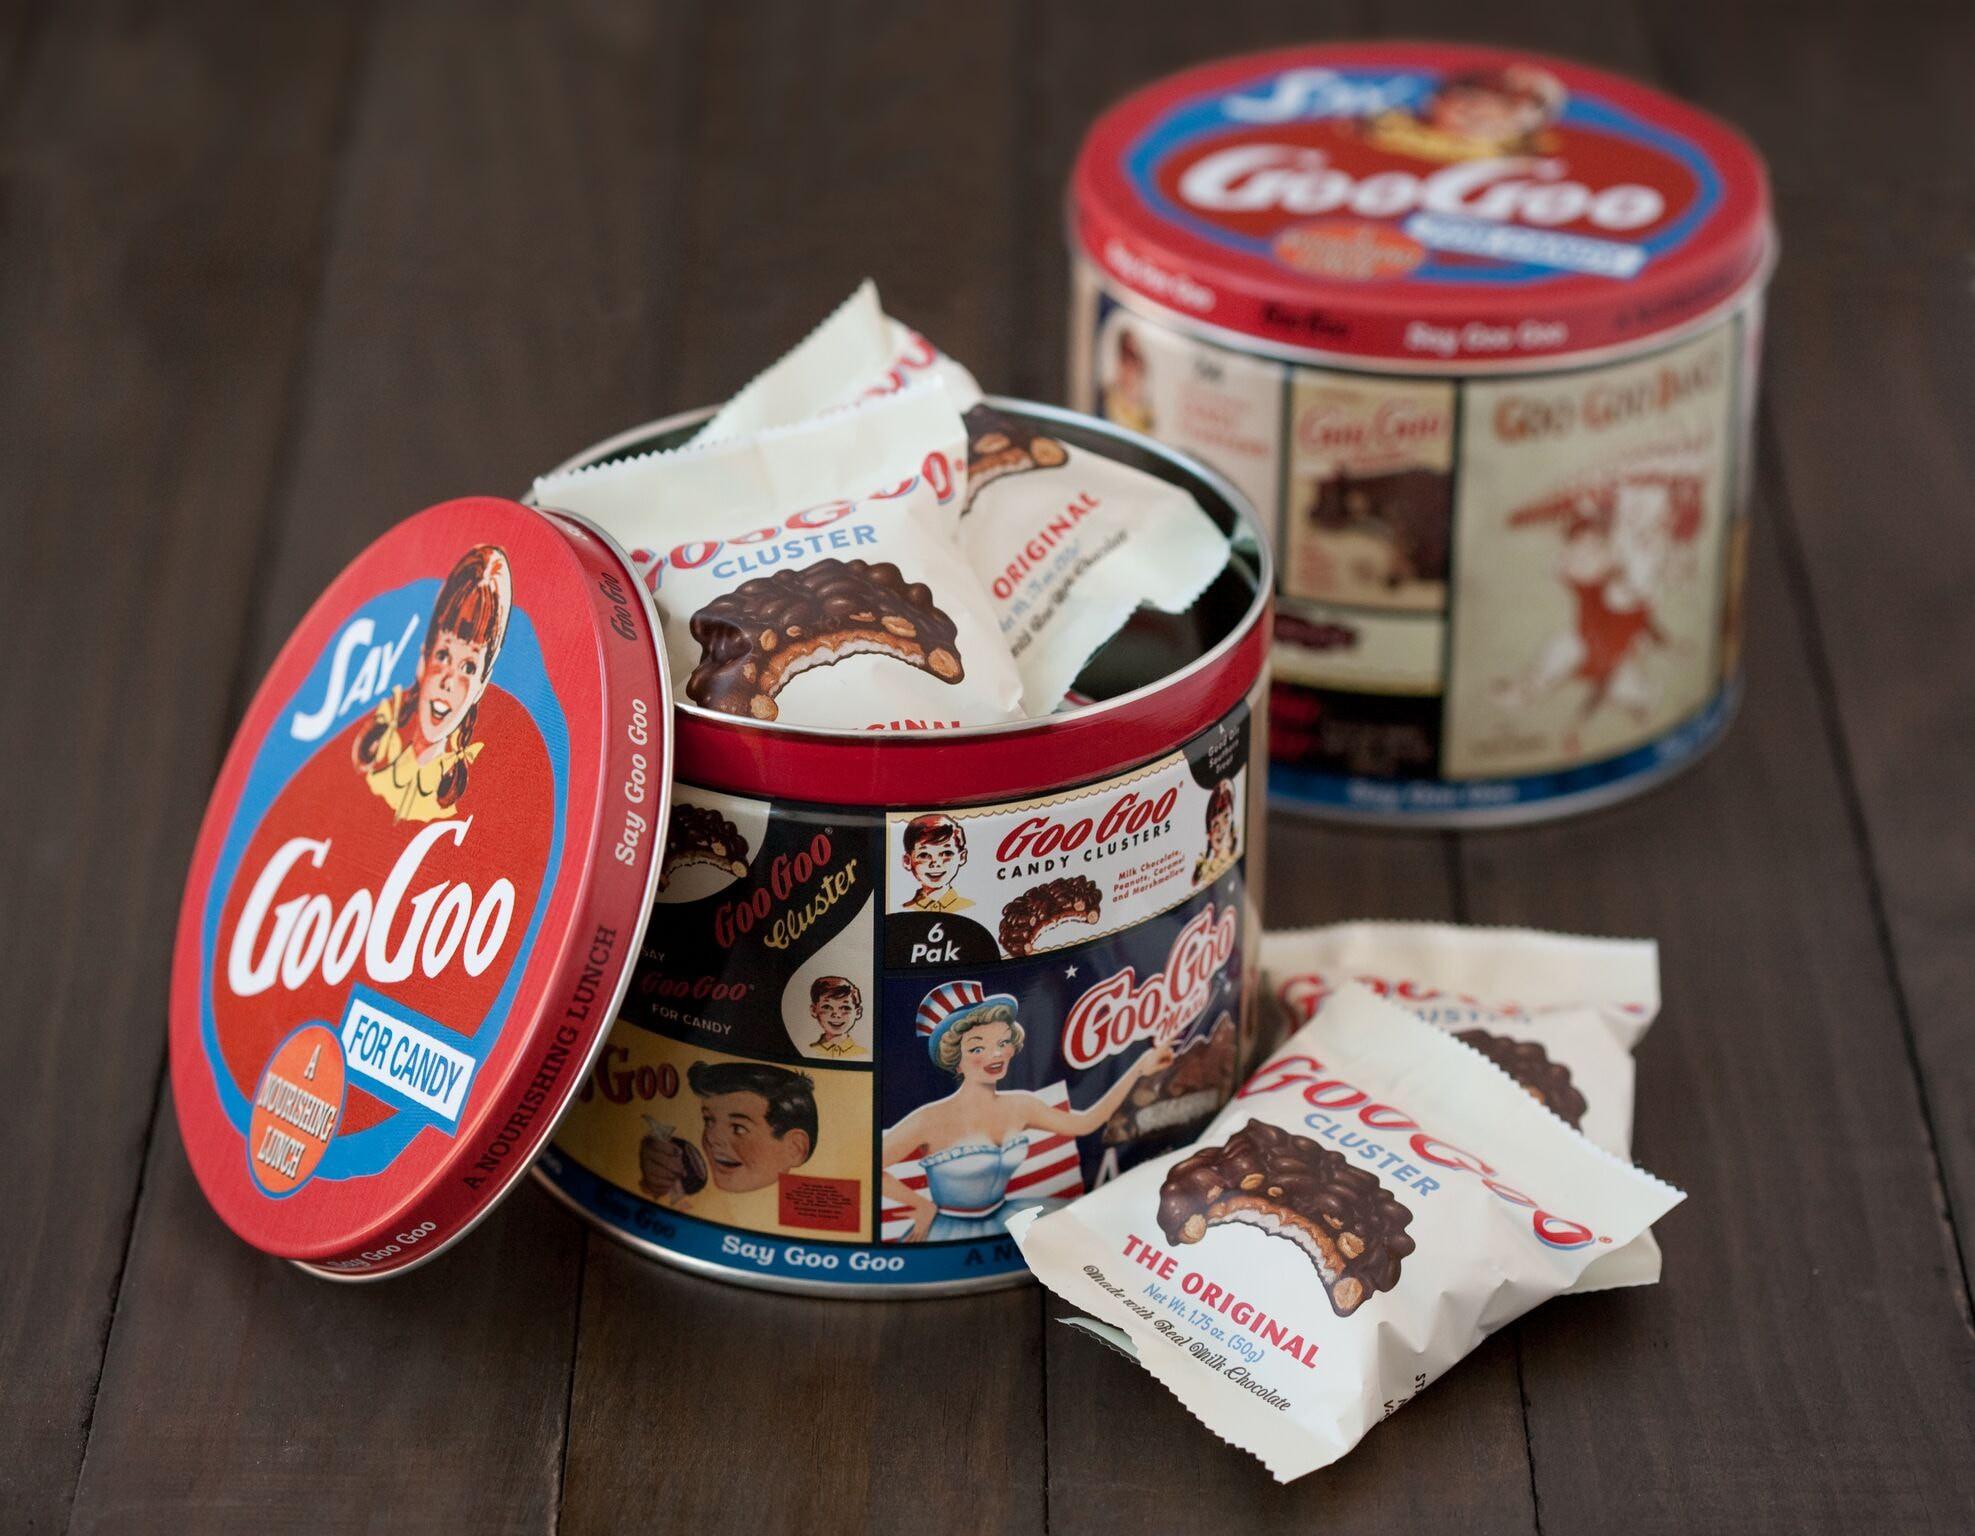 Goo Goo Cluster tin with the Original Goo Goo Cluster